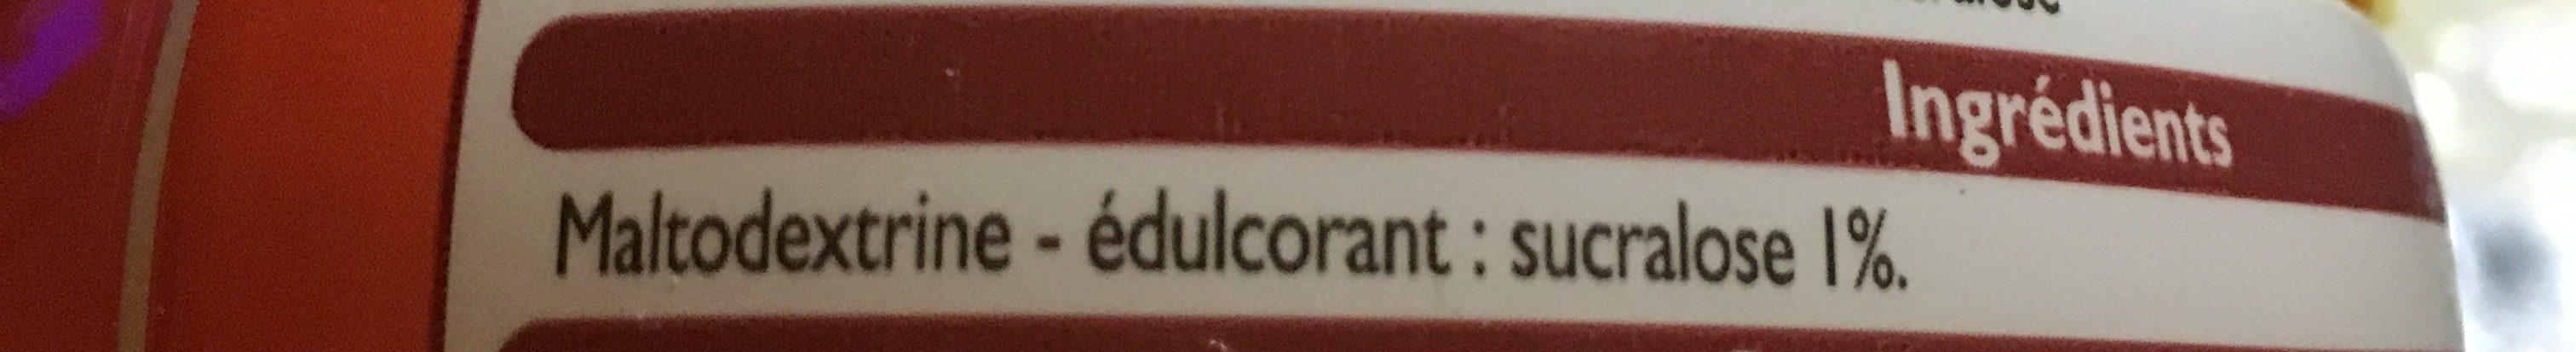 Édulcorant à base de Sucralose - Ingrediënten